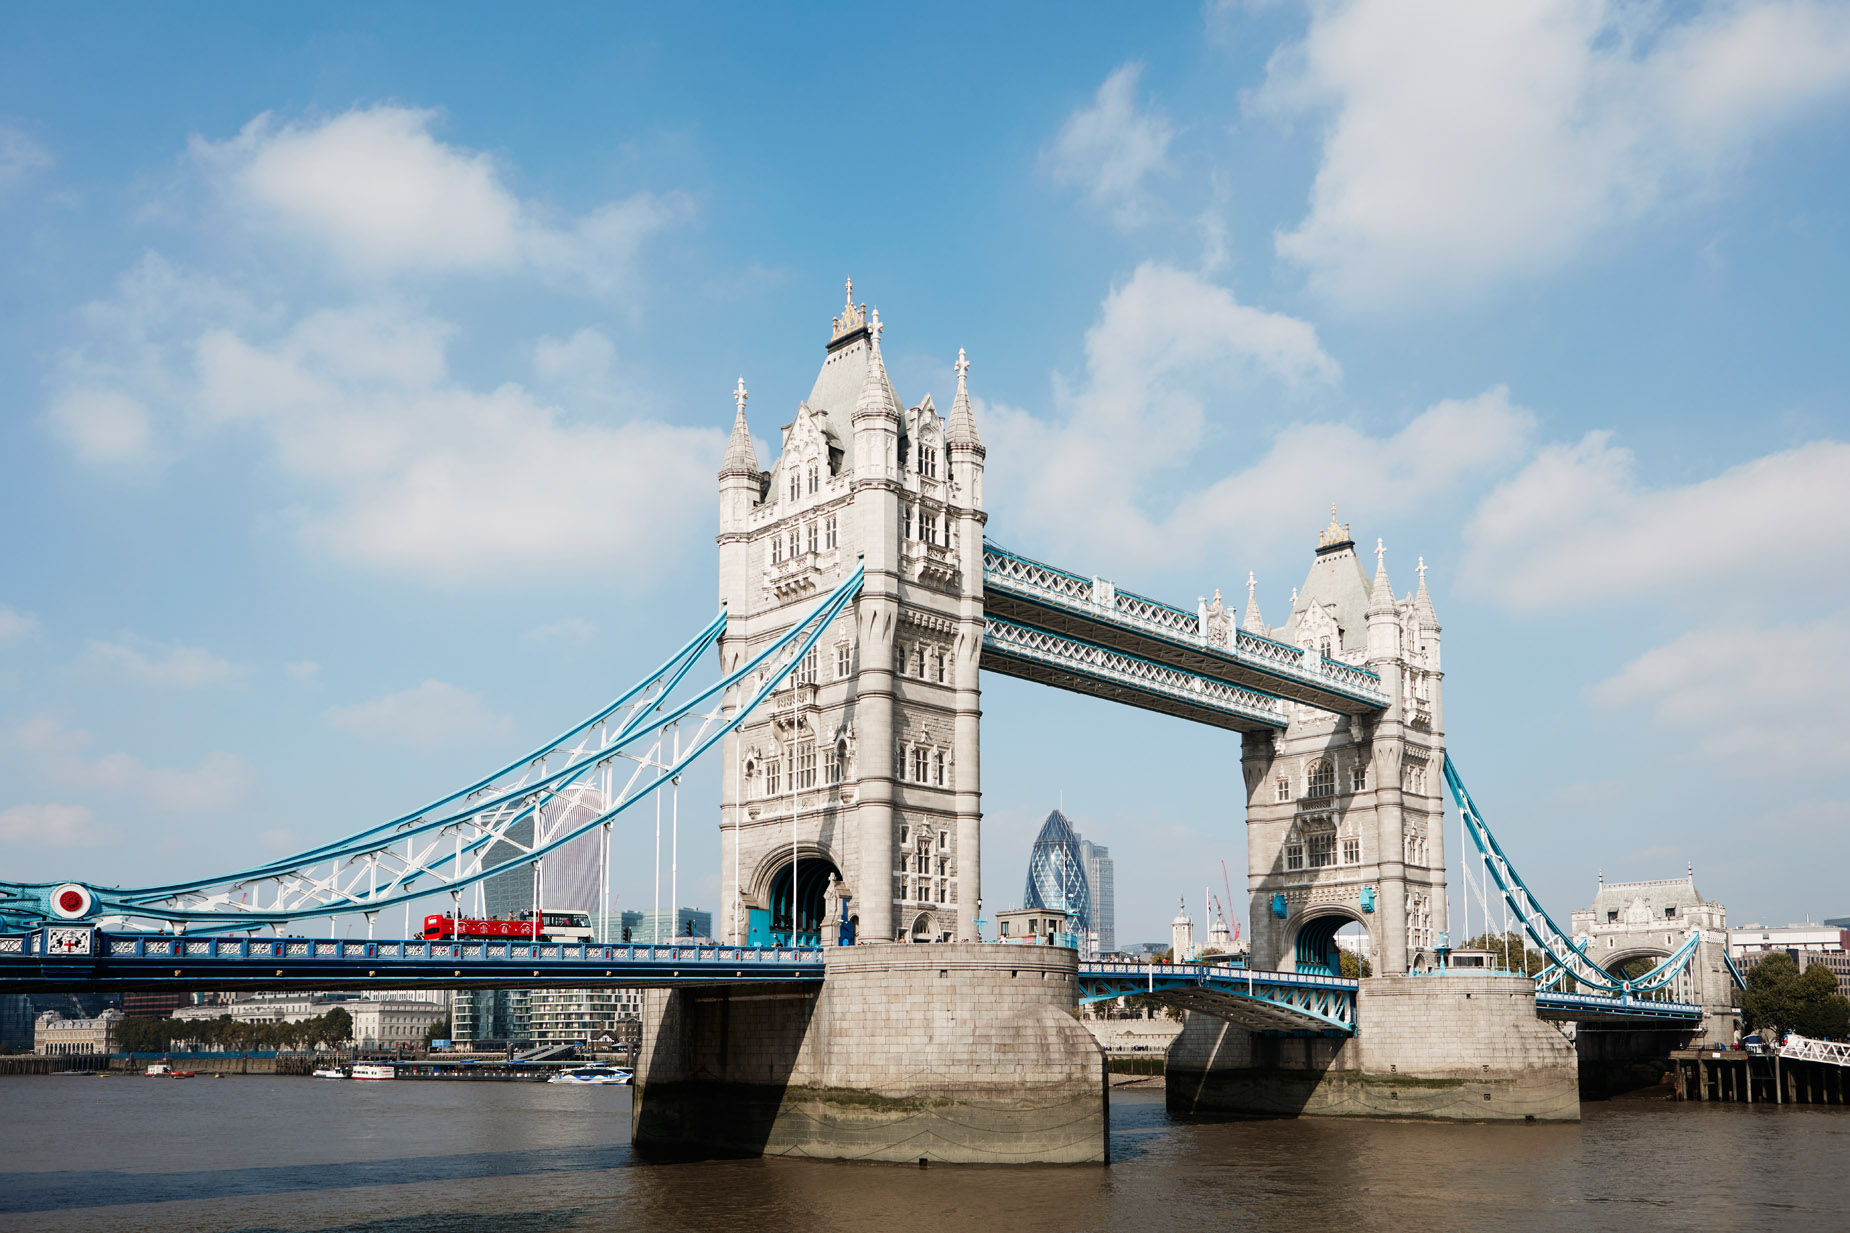 London S Tower Bridge